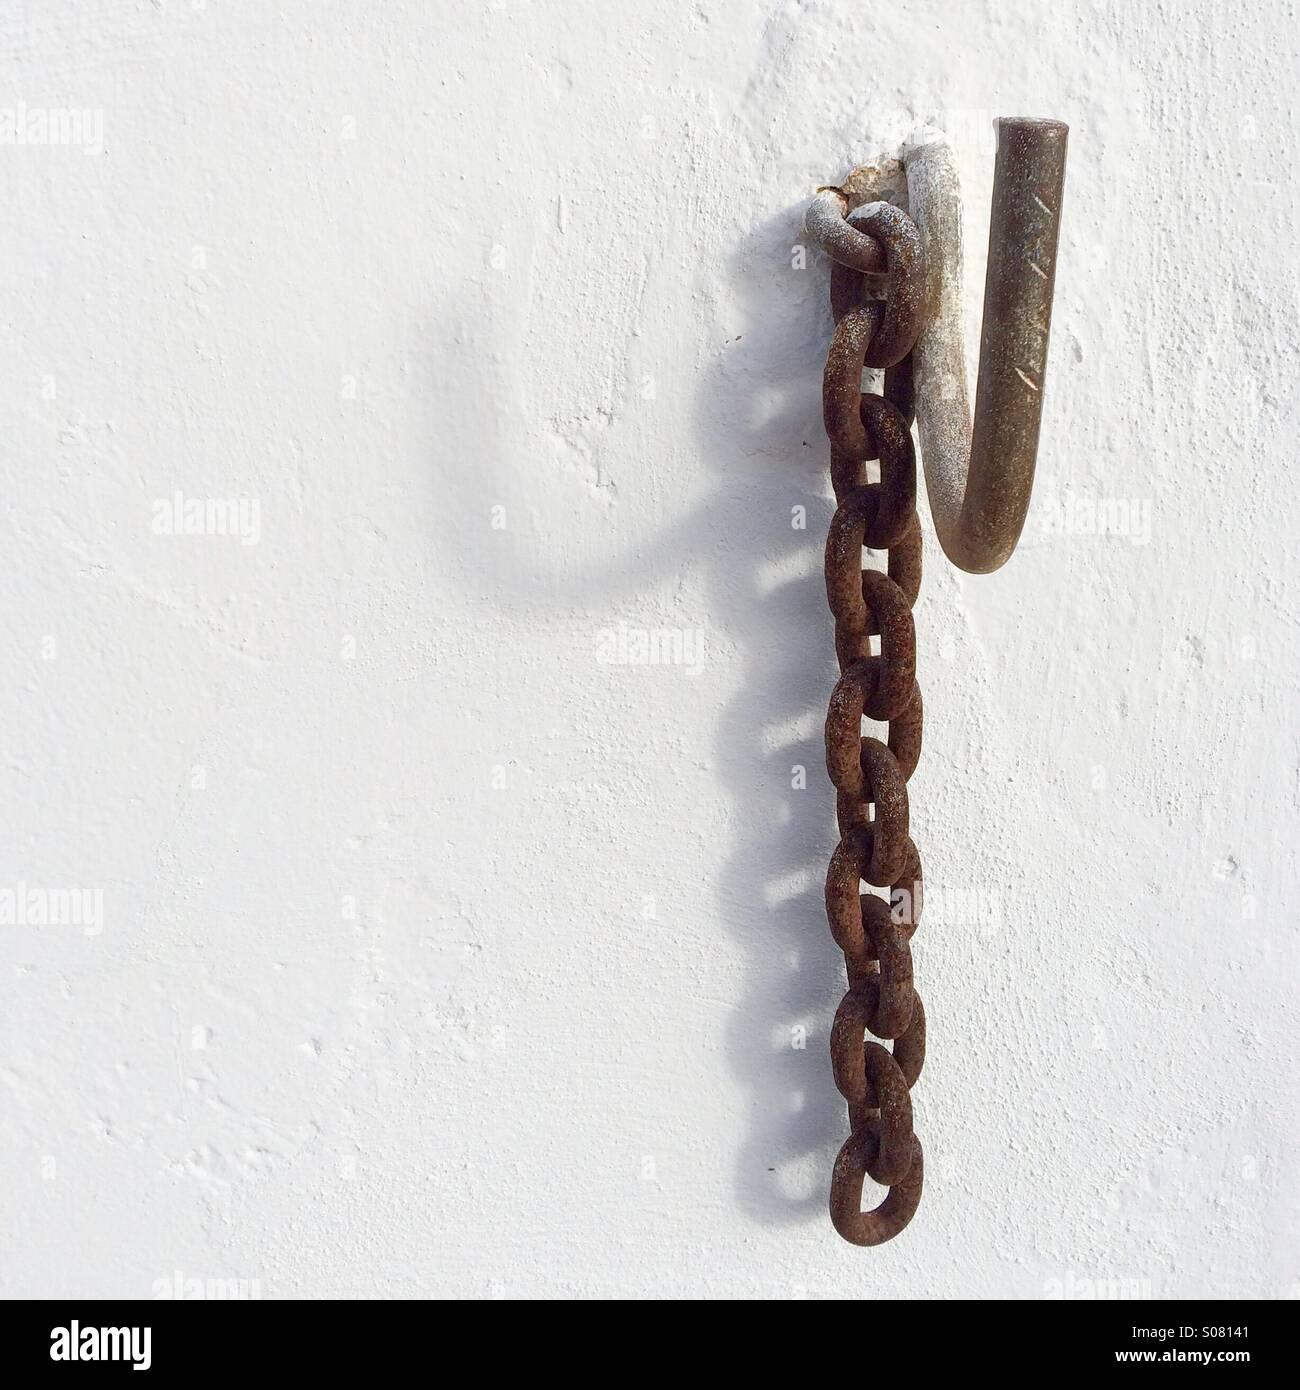 Hanging chain - Stock Image